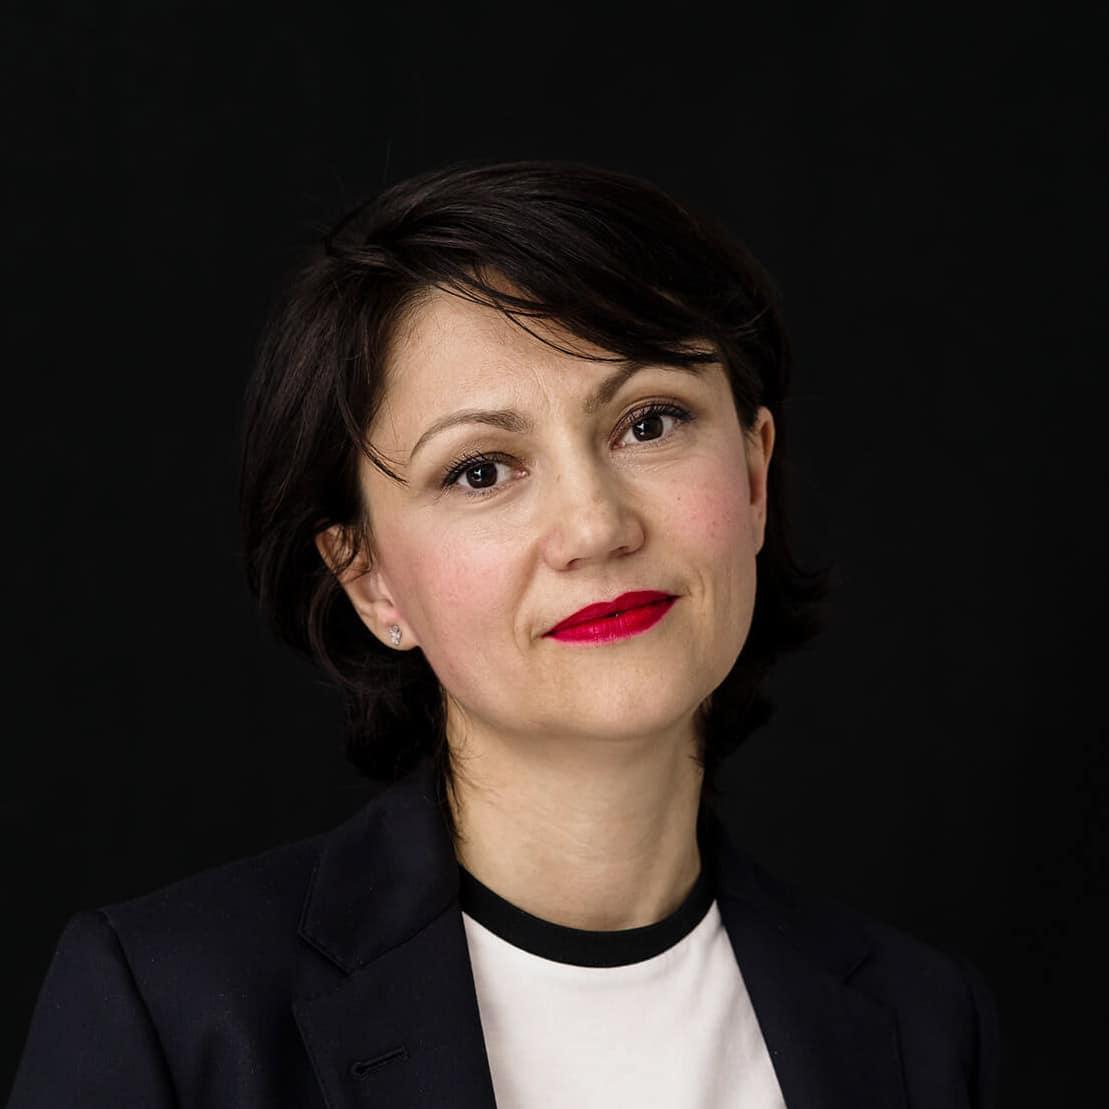 Carmen Uscatu